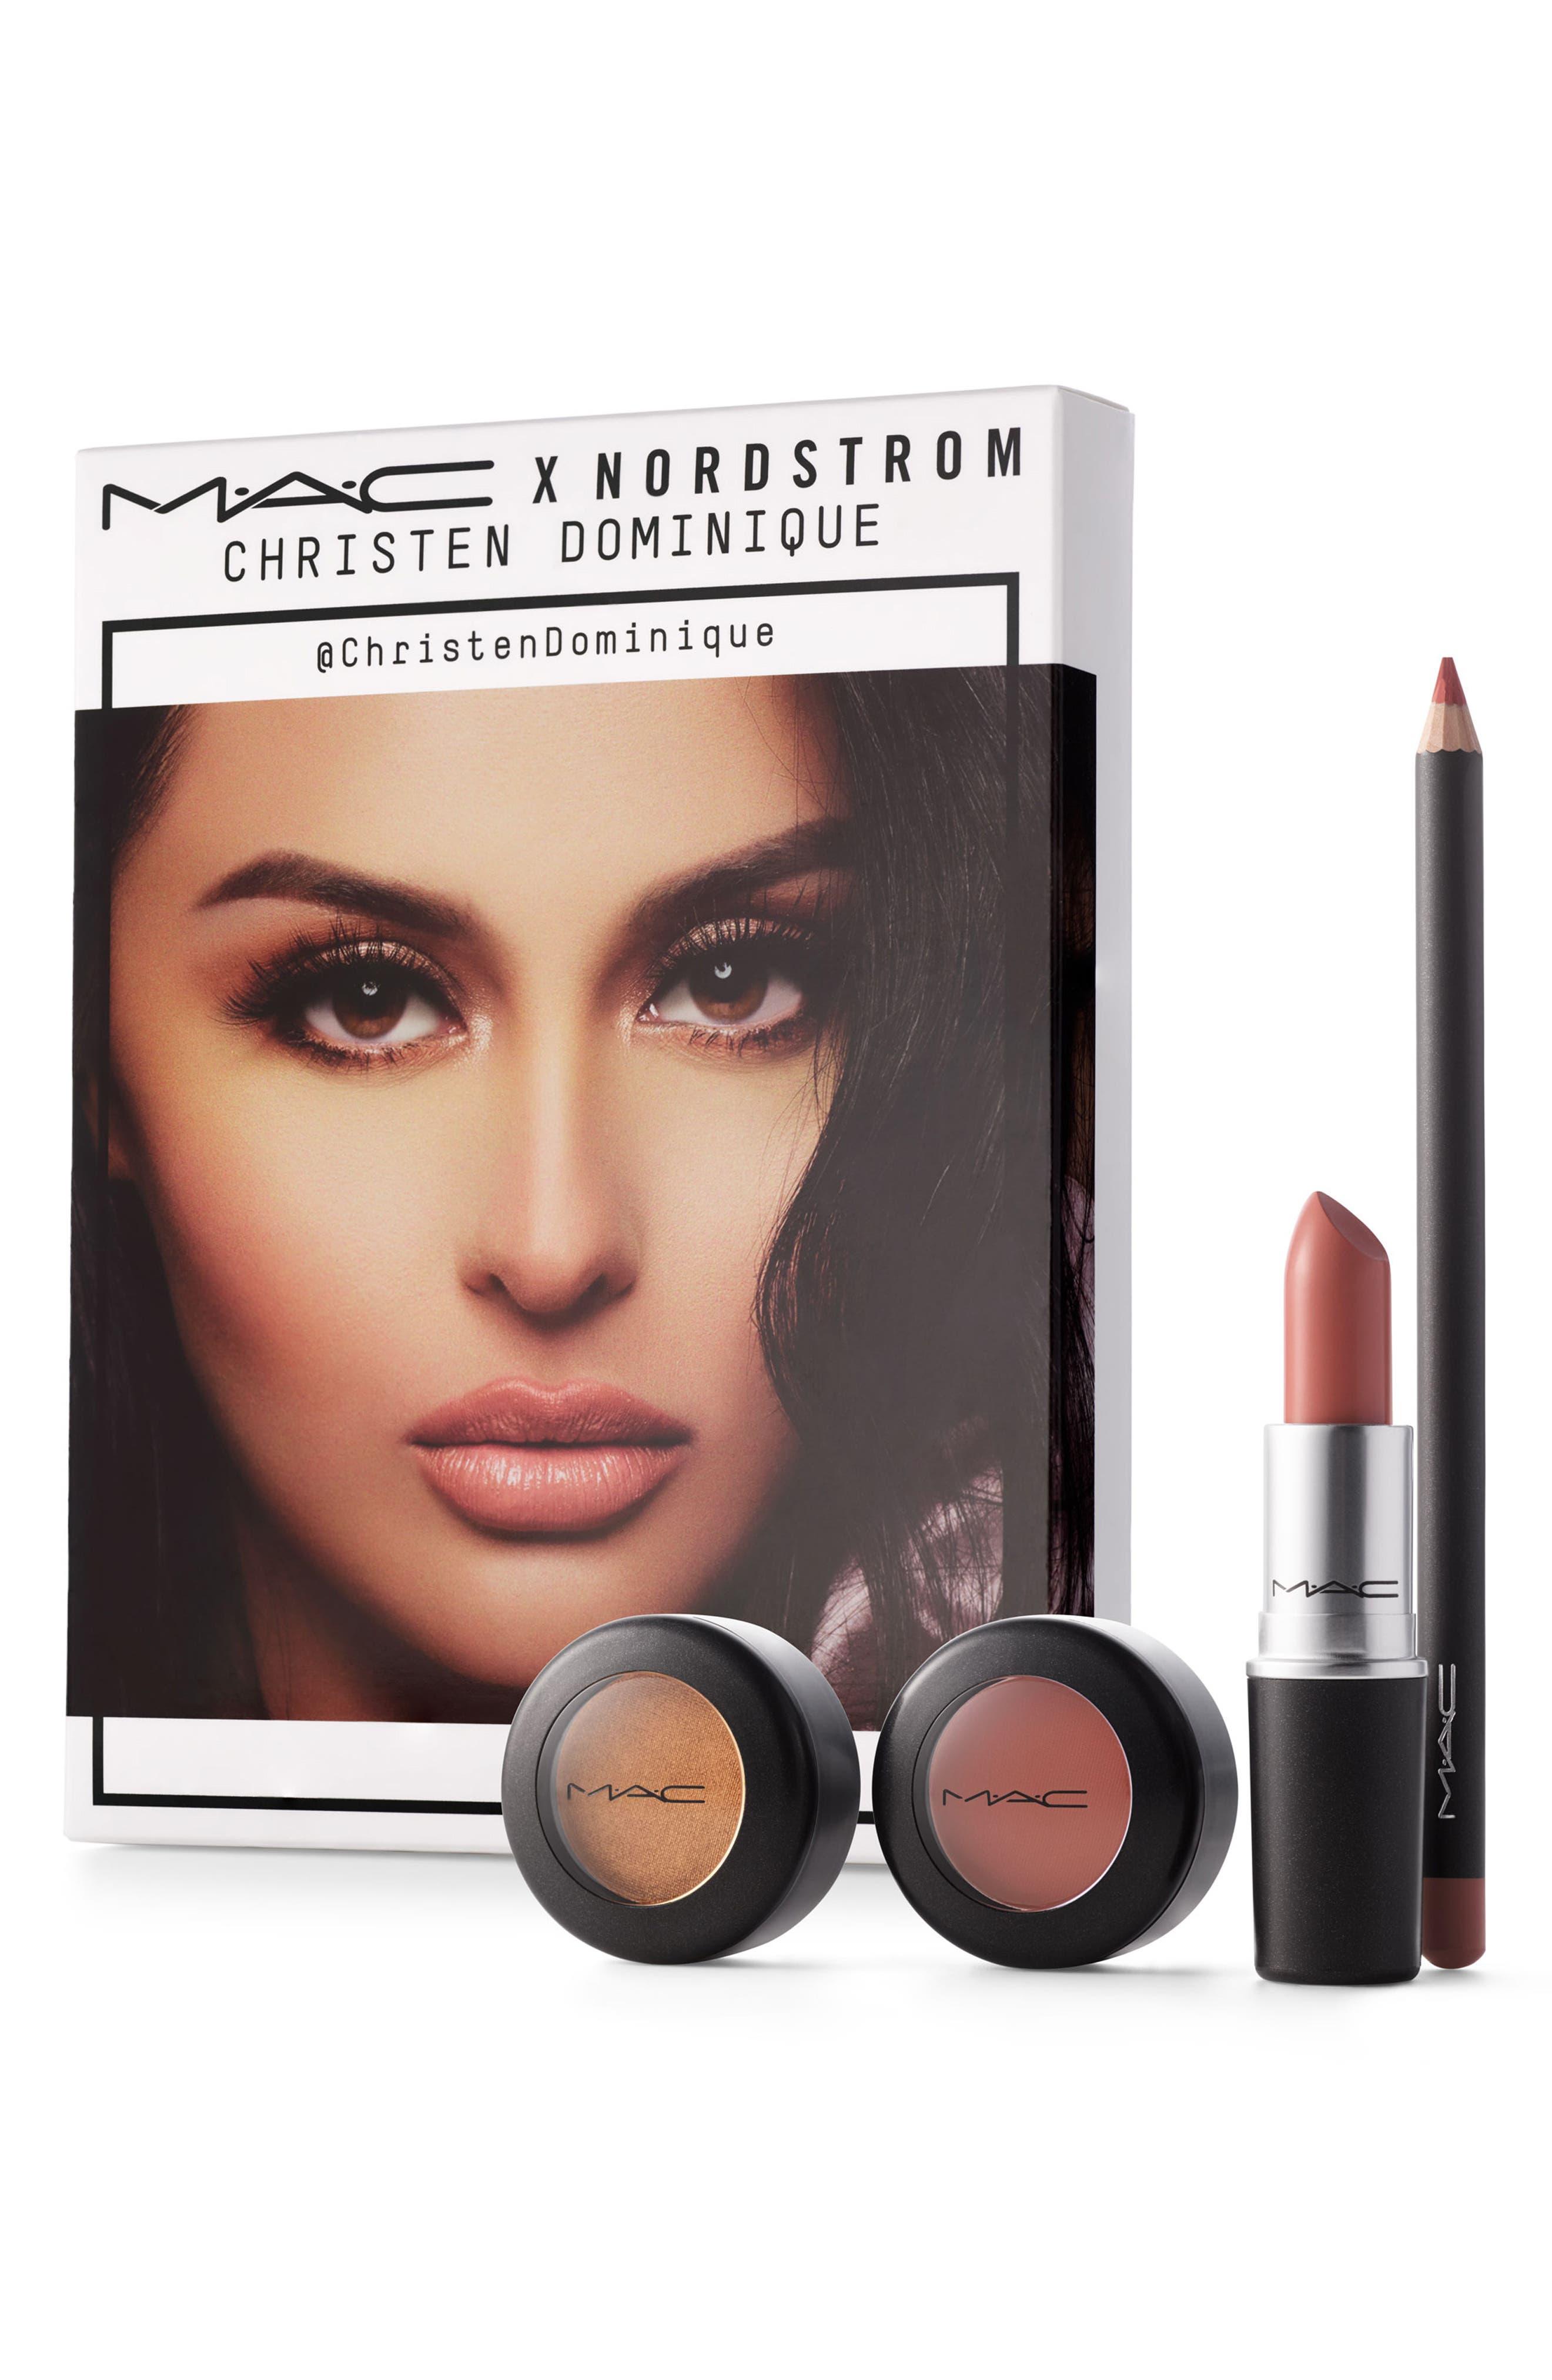 Take Mac Makeup Cles Saubhaya